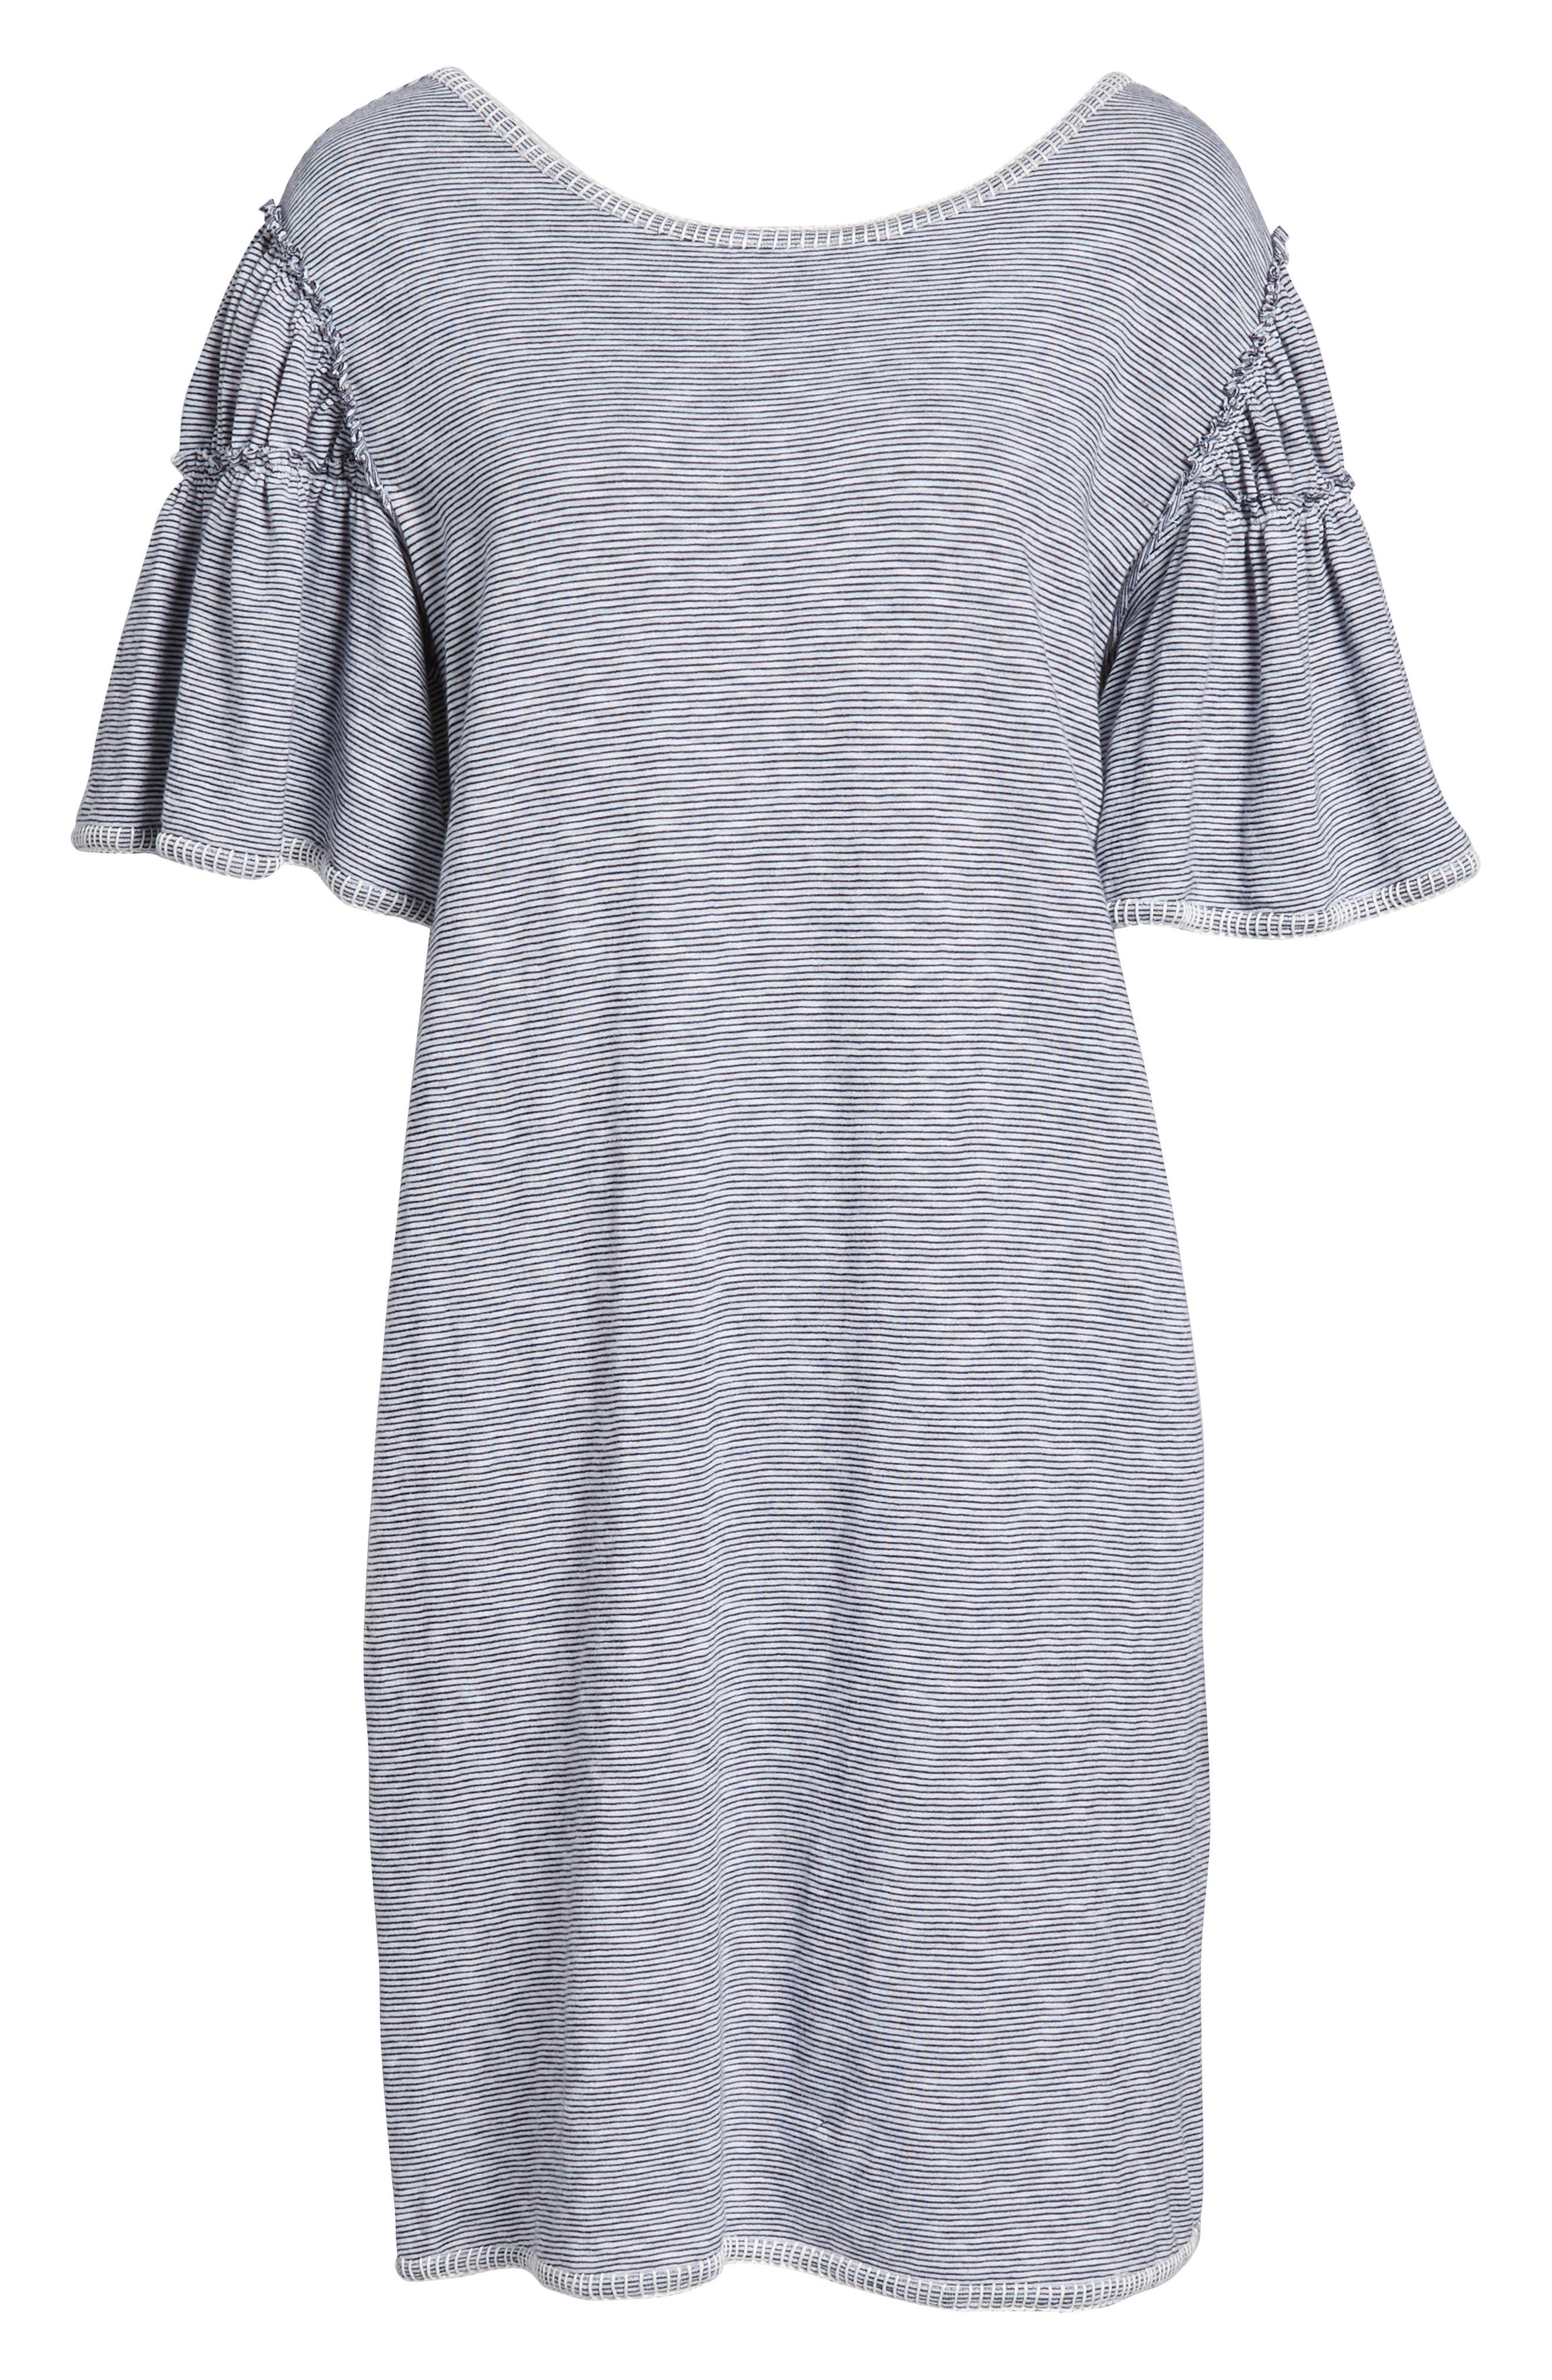 Flounce Sleeve Knit Dress,                             Alternate thumbnail 6, color,                             White- Navy Nicole Stripe